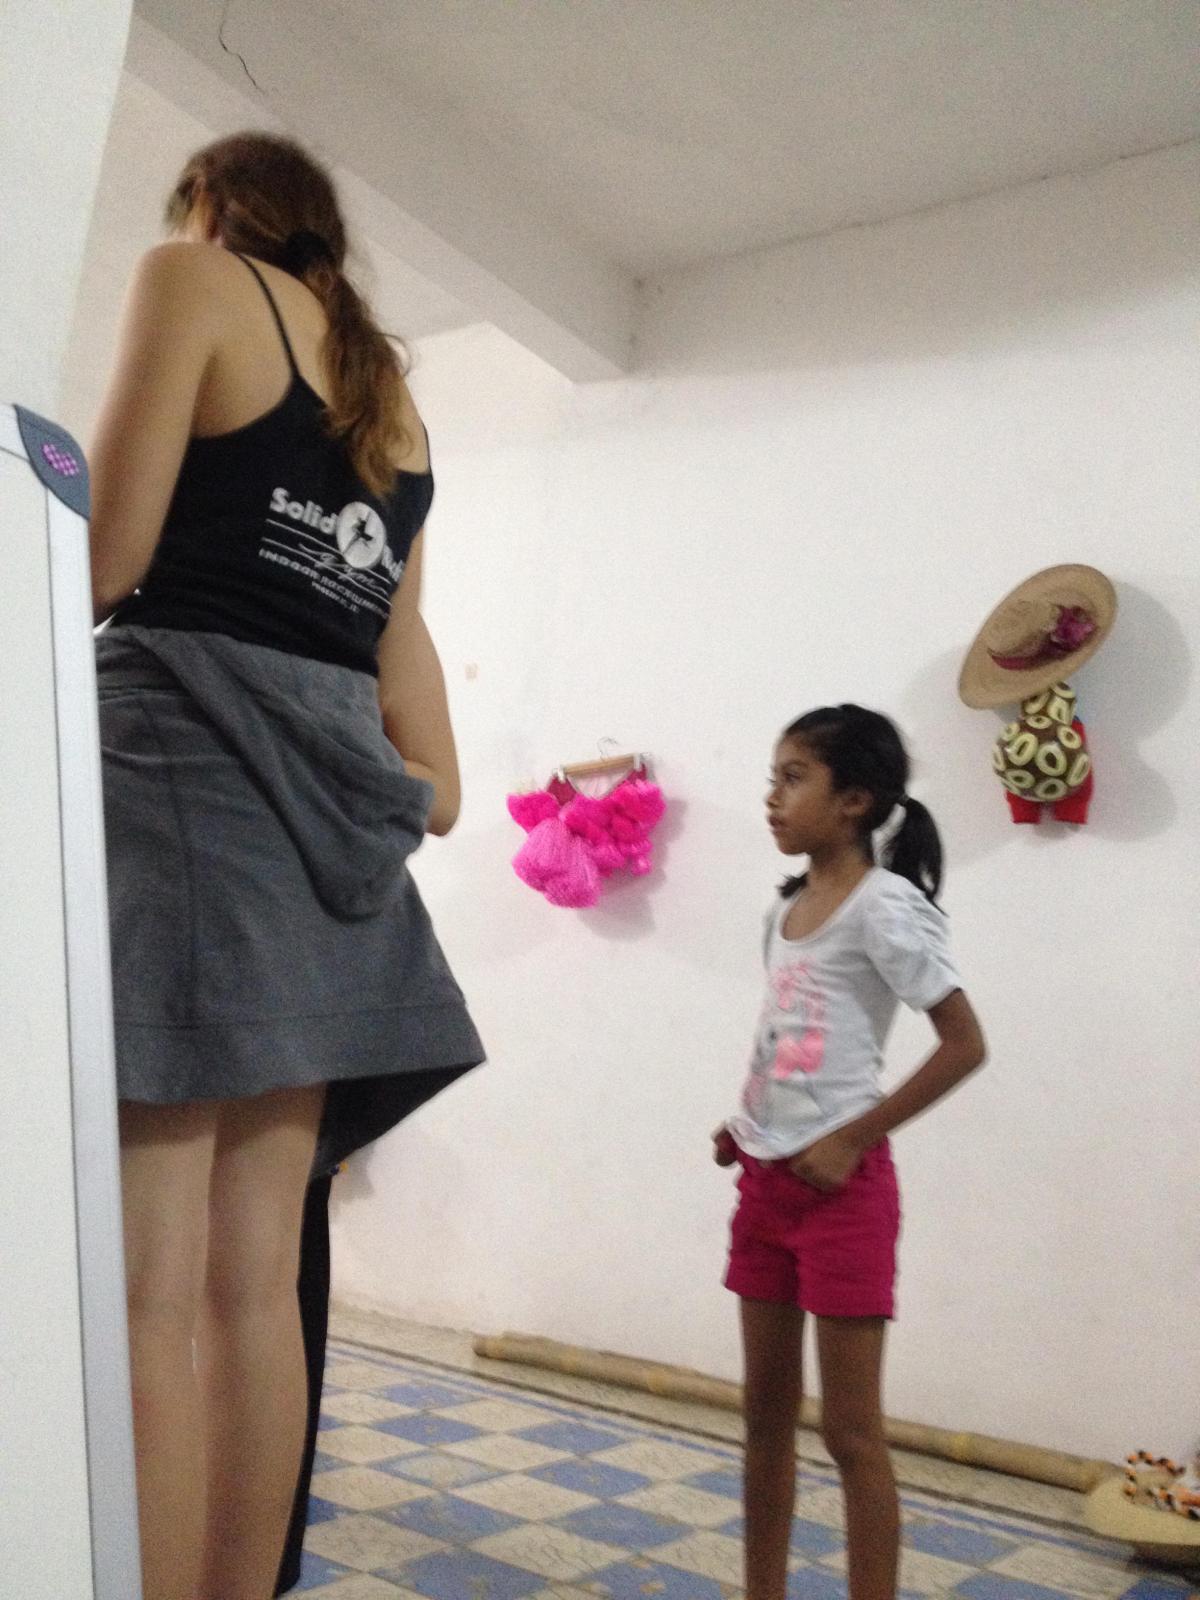 Things to Do in Progreso Yucatan: Belly Dance Classes